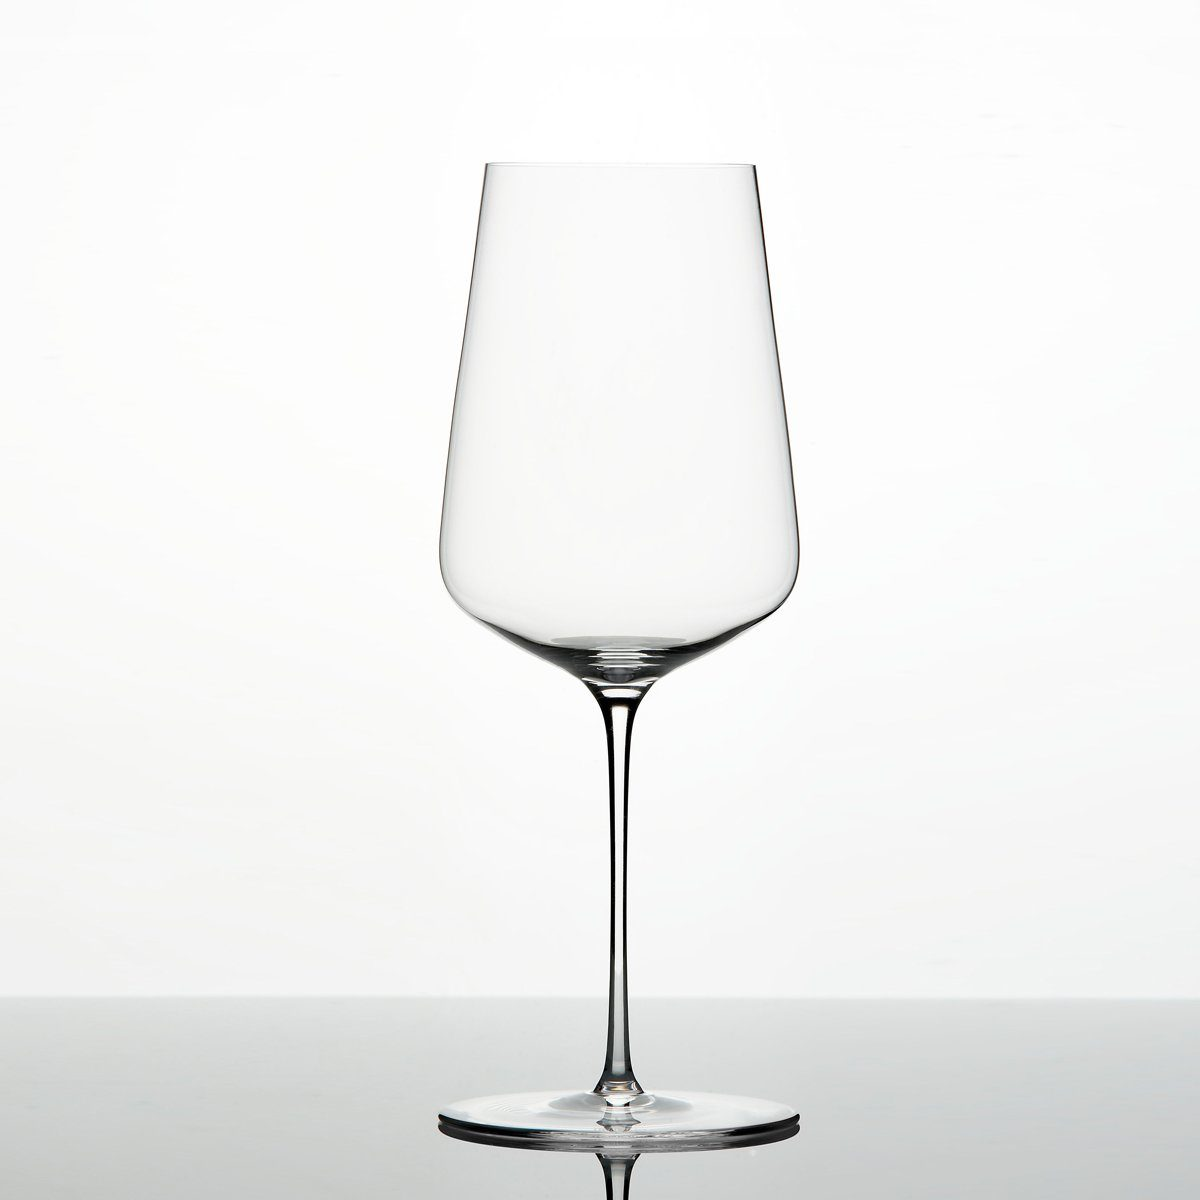 Zalto Zalto Universalweinglas DENKART spülmaschinenfest 6 Stück